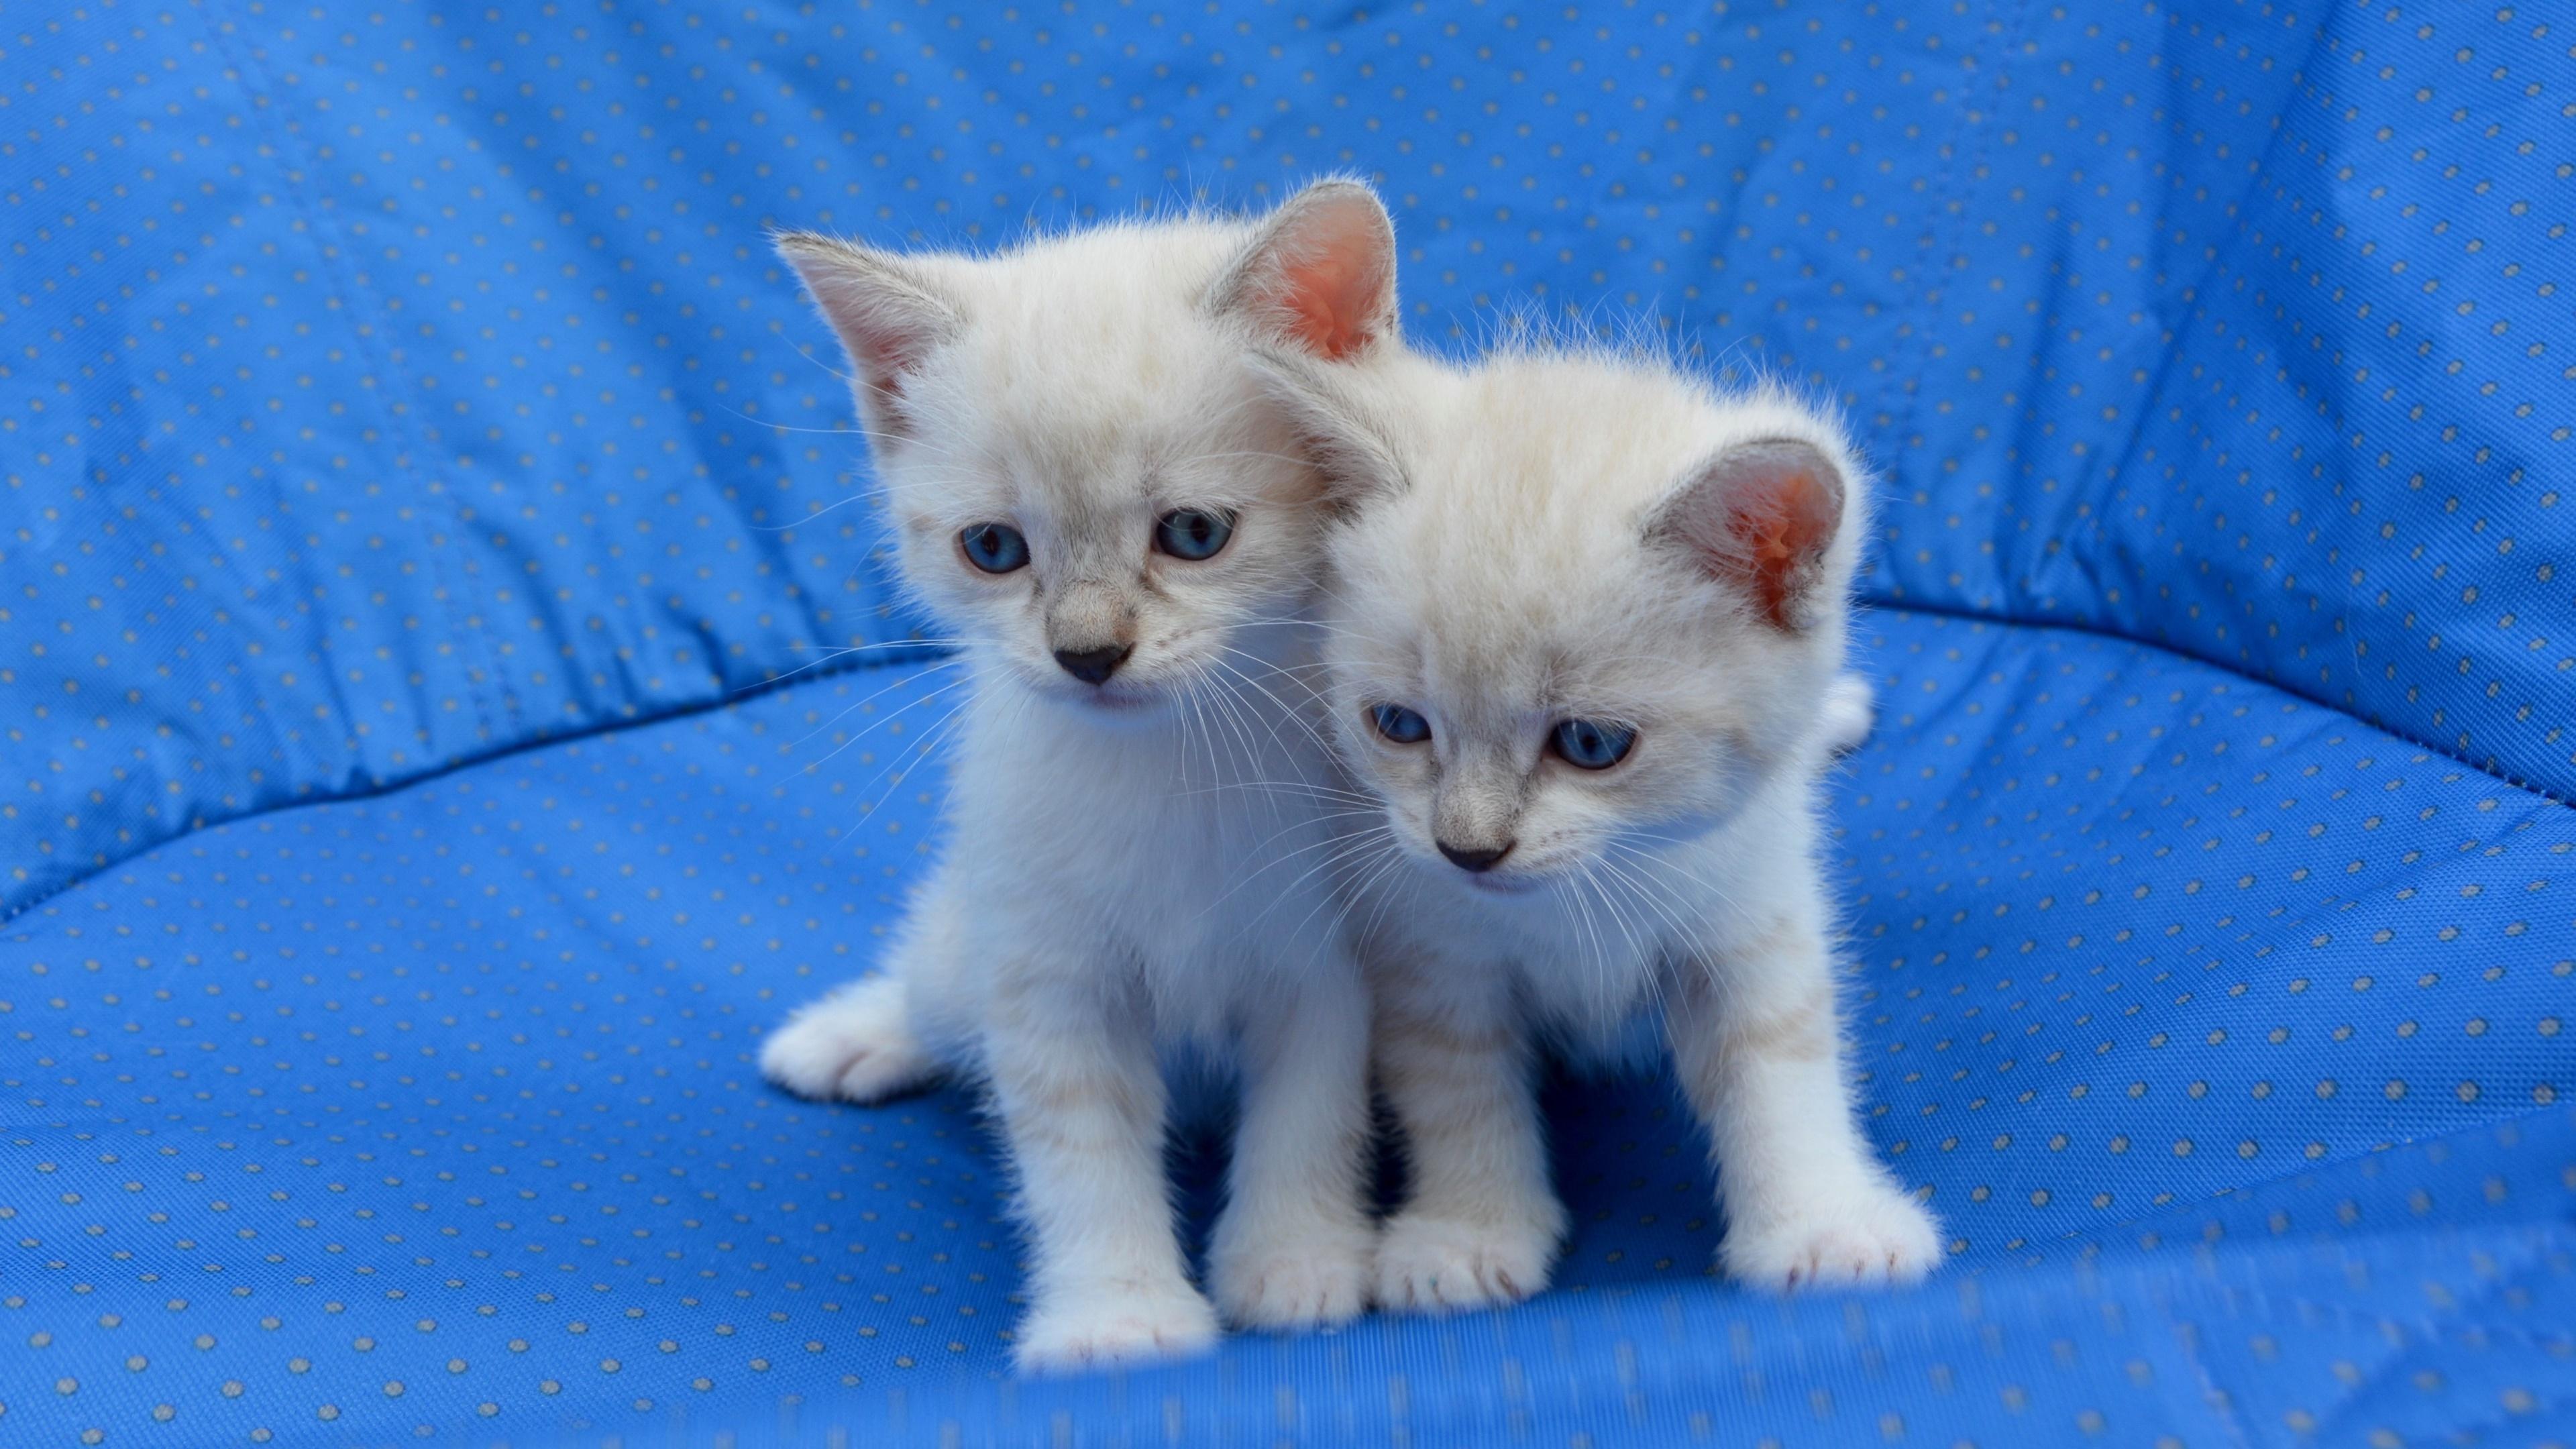 hintergrundbilder katzenbabys